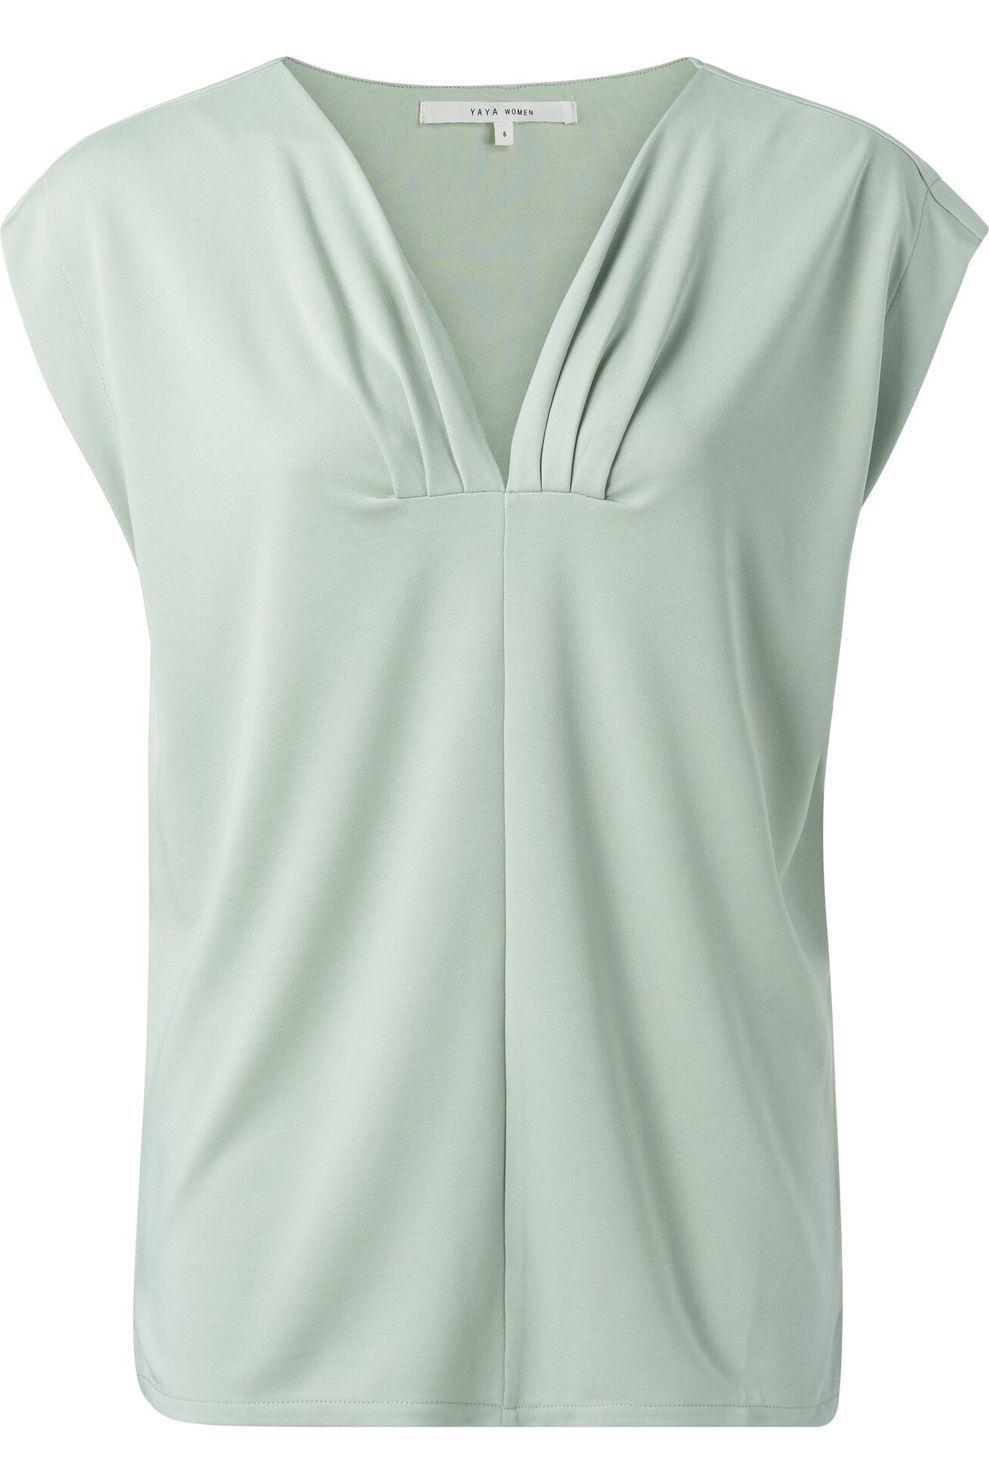 YAYA T-Shirt With Pleated Neckline voor dames - Groen - Maten: XS, S, M, L, XL